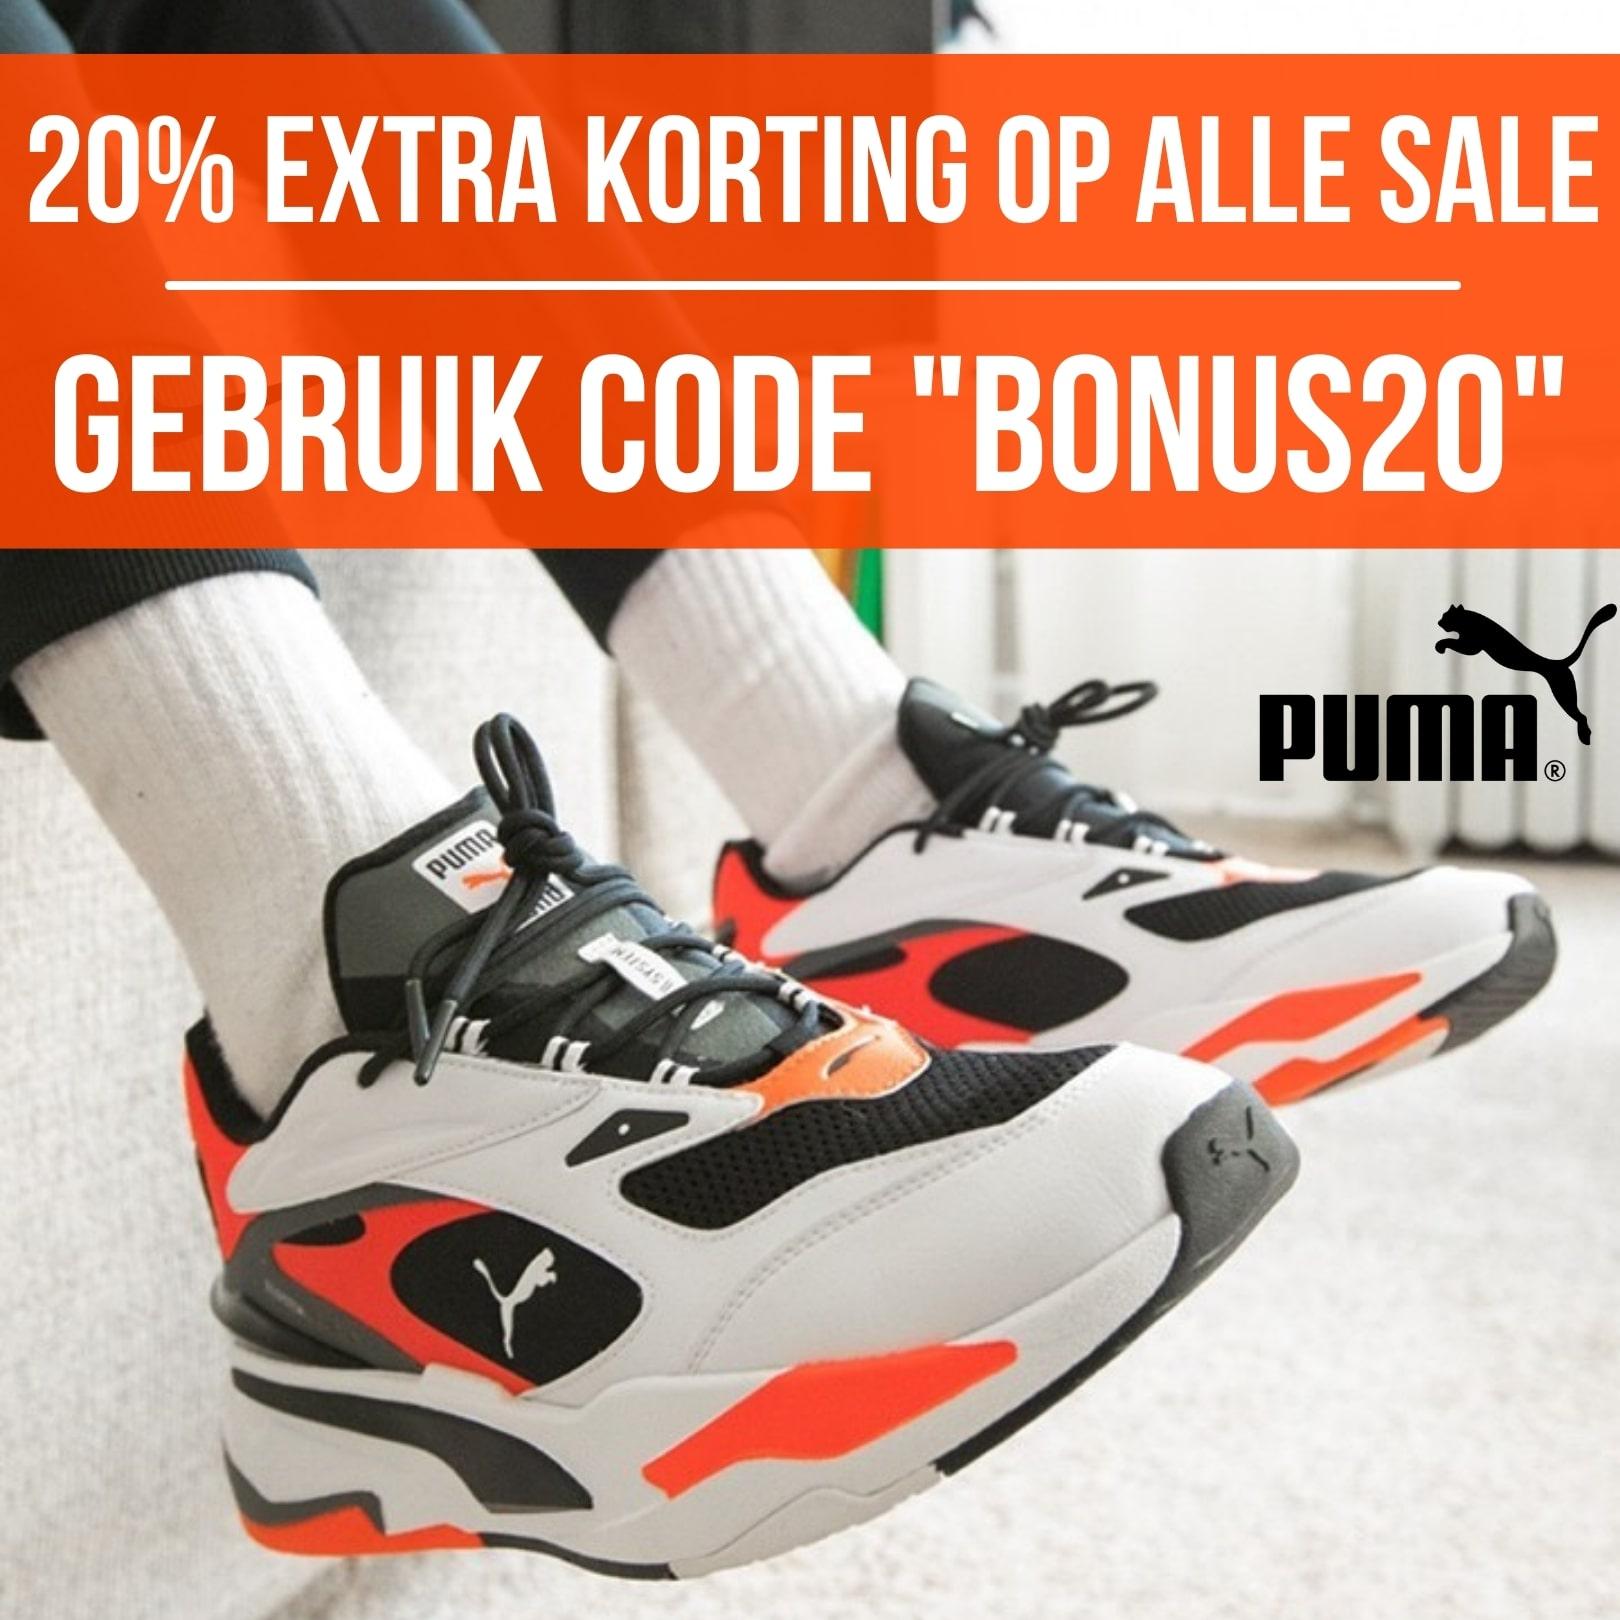 "Puma kortingscode ""BONUS20"" voor 20% extra korting"